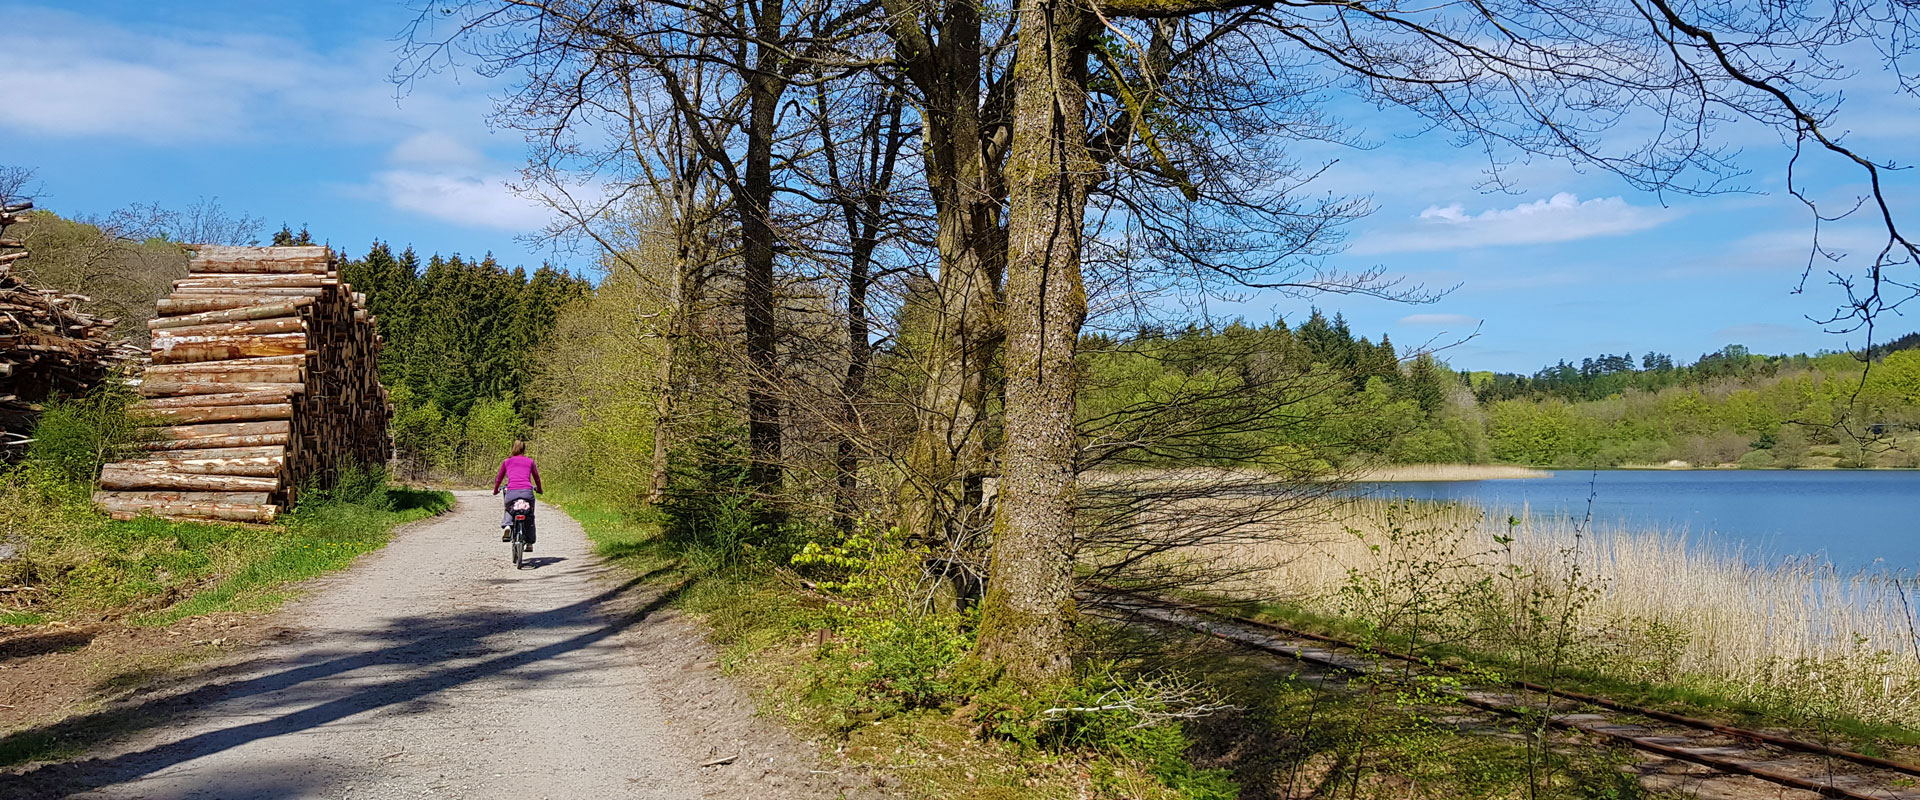 Cykelferie i Østjylland